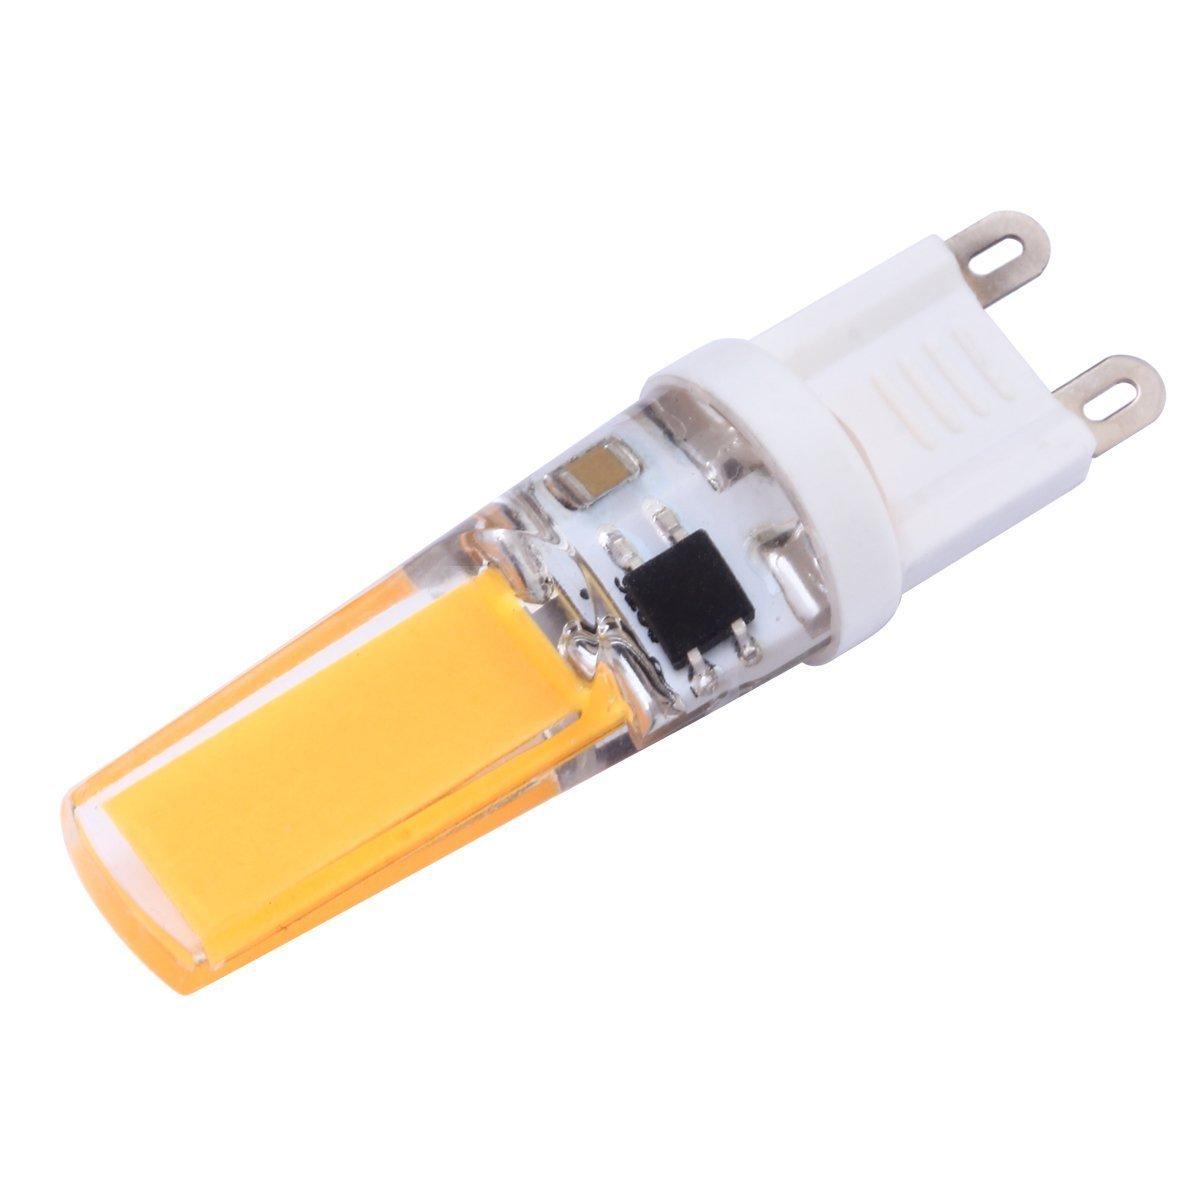 COB 2508 200-240 LM Blanco cálido/Blanco frío T Dimmable Bi-Pin Luces AC 220-240 V Wkae Led Light 10Pcs G9 Bombillas LED 3W 2 Color : Blanco frío